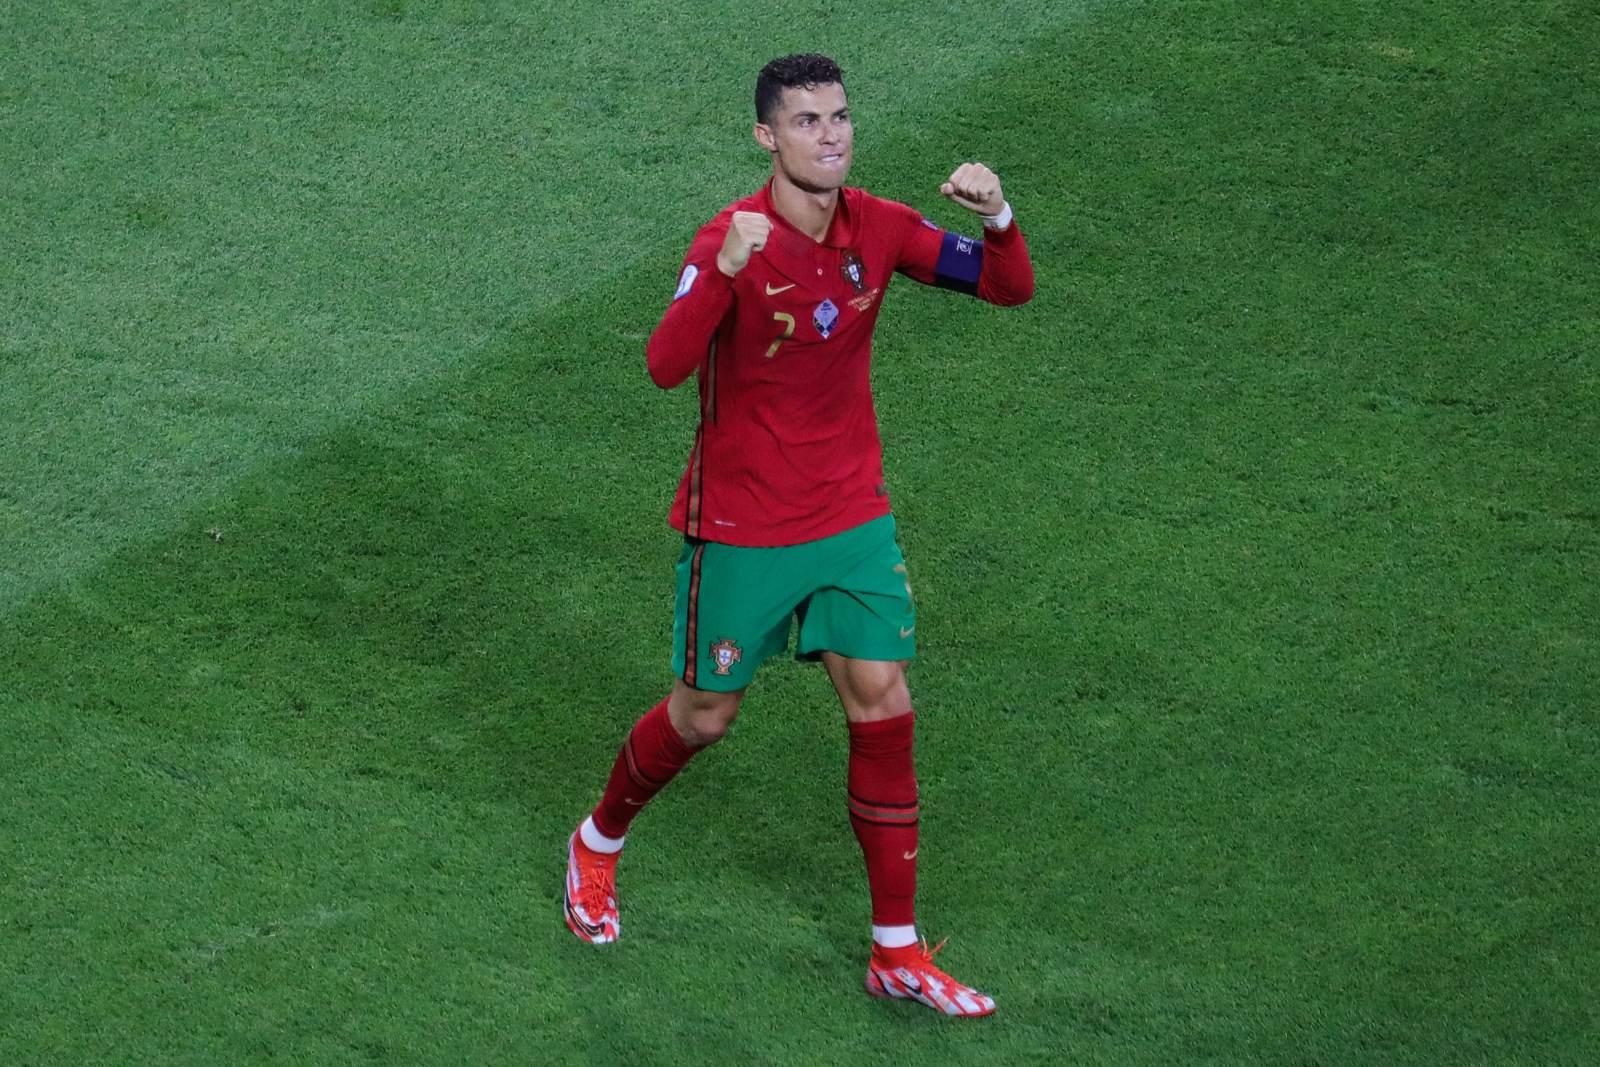 Роналду установил очередной рекорд